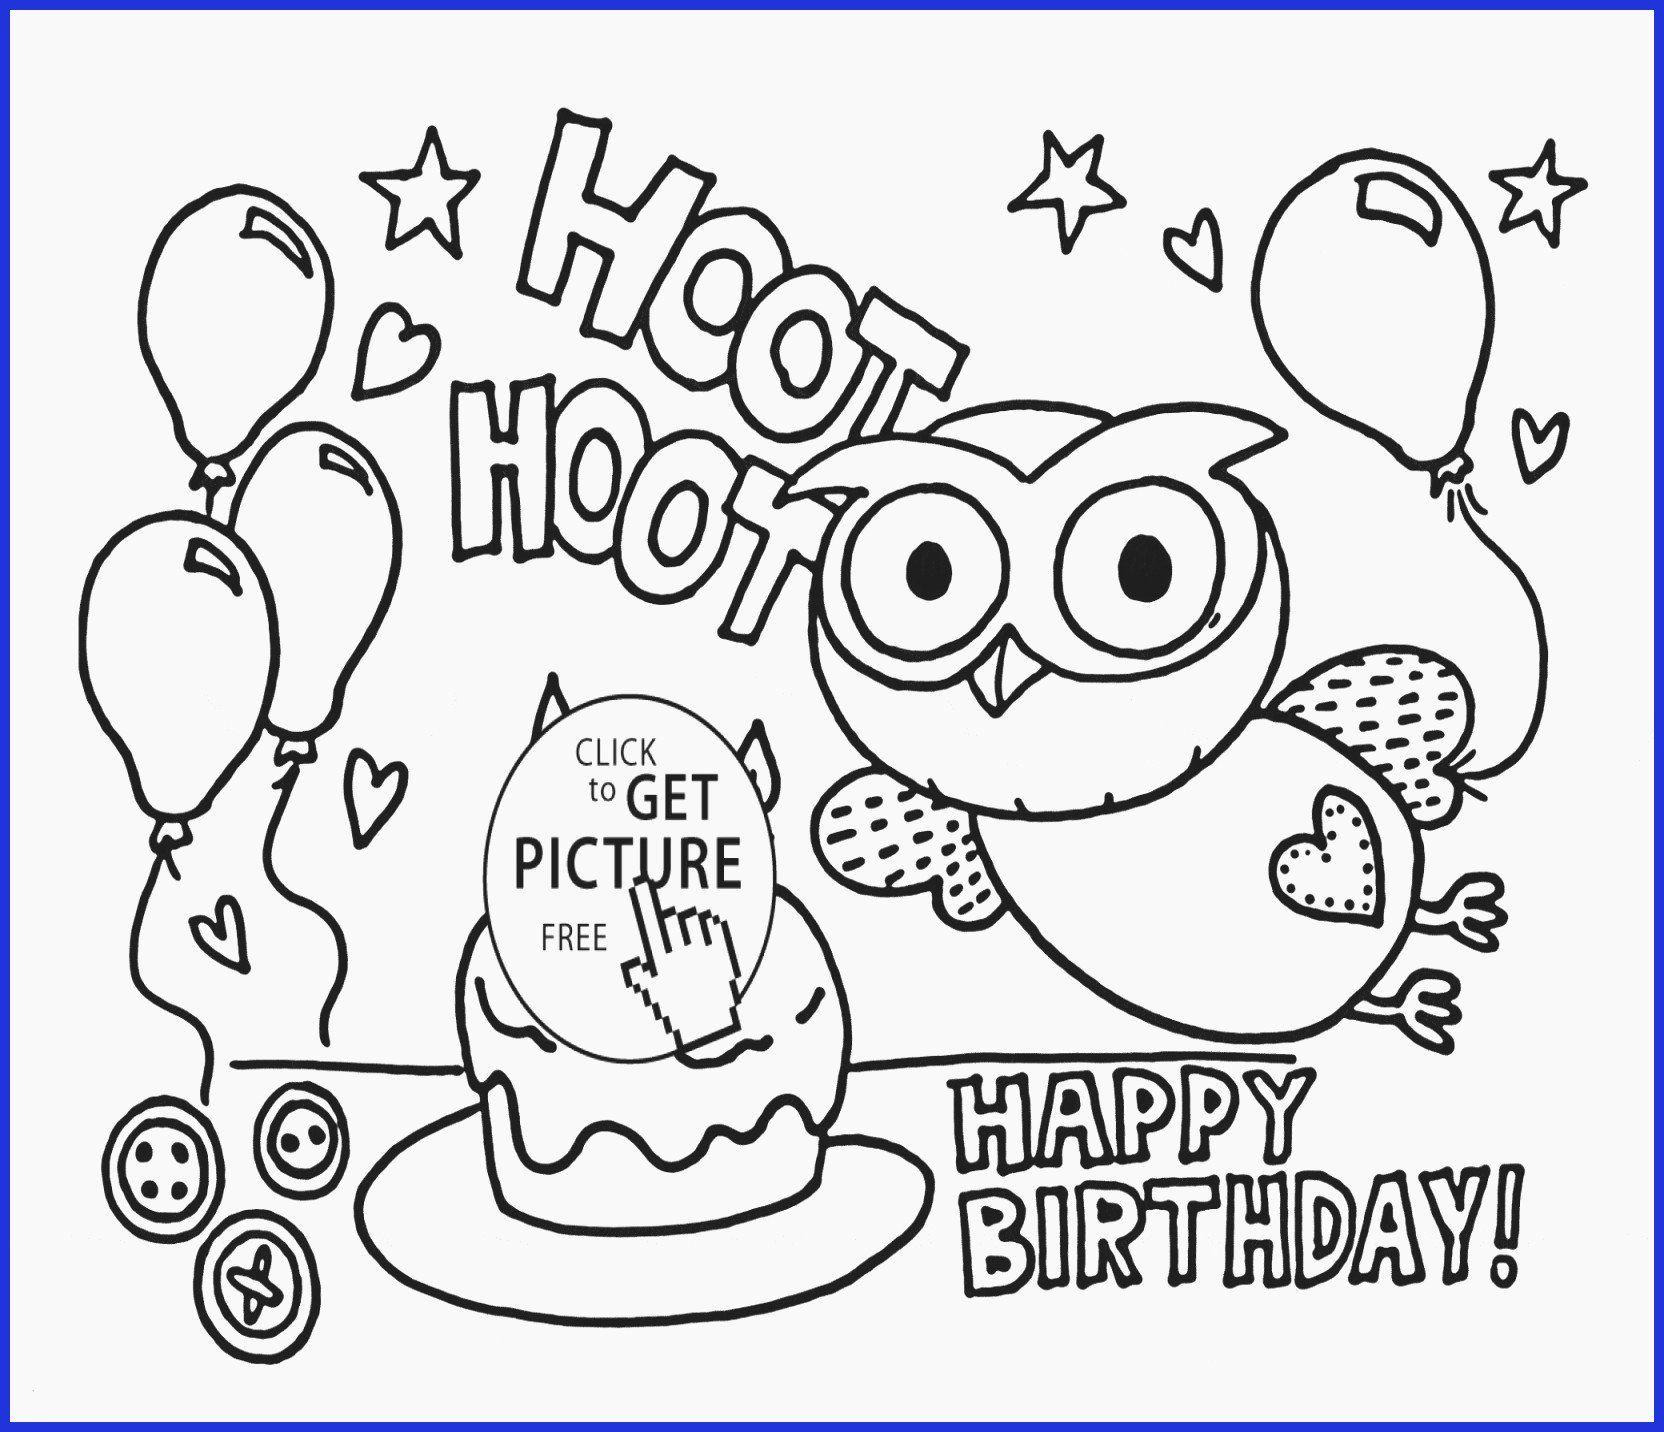 Humor Happy Birthday Images in 2020 | Happy birthday ...